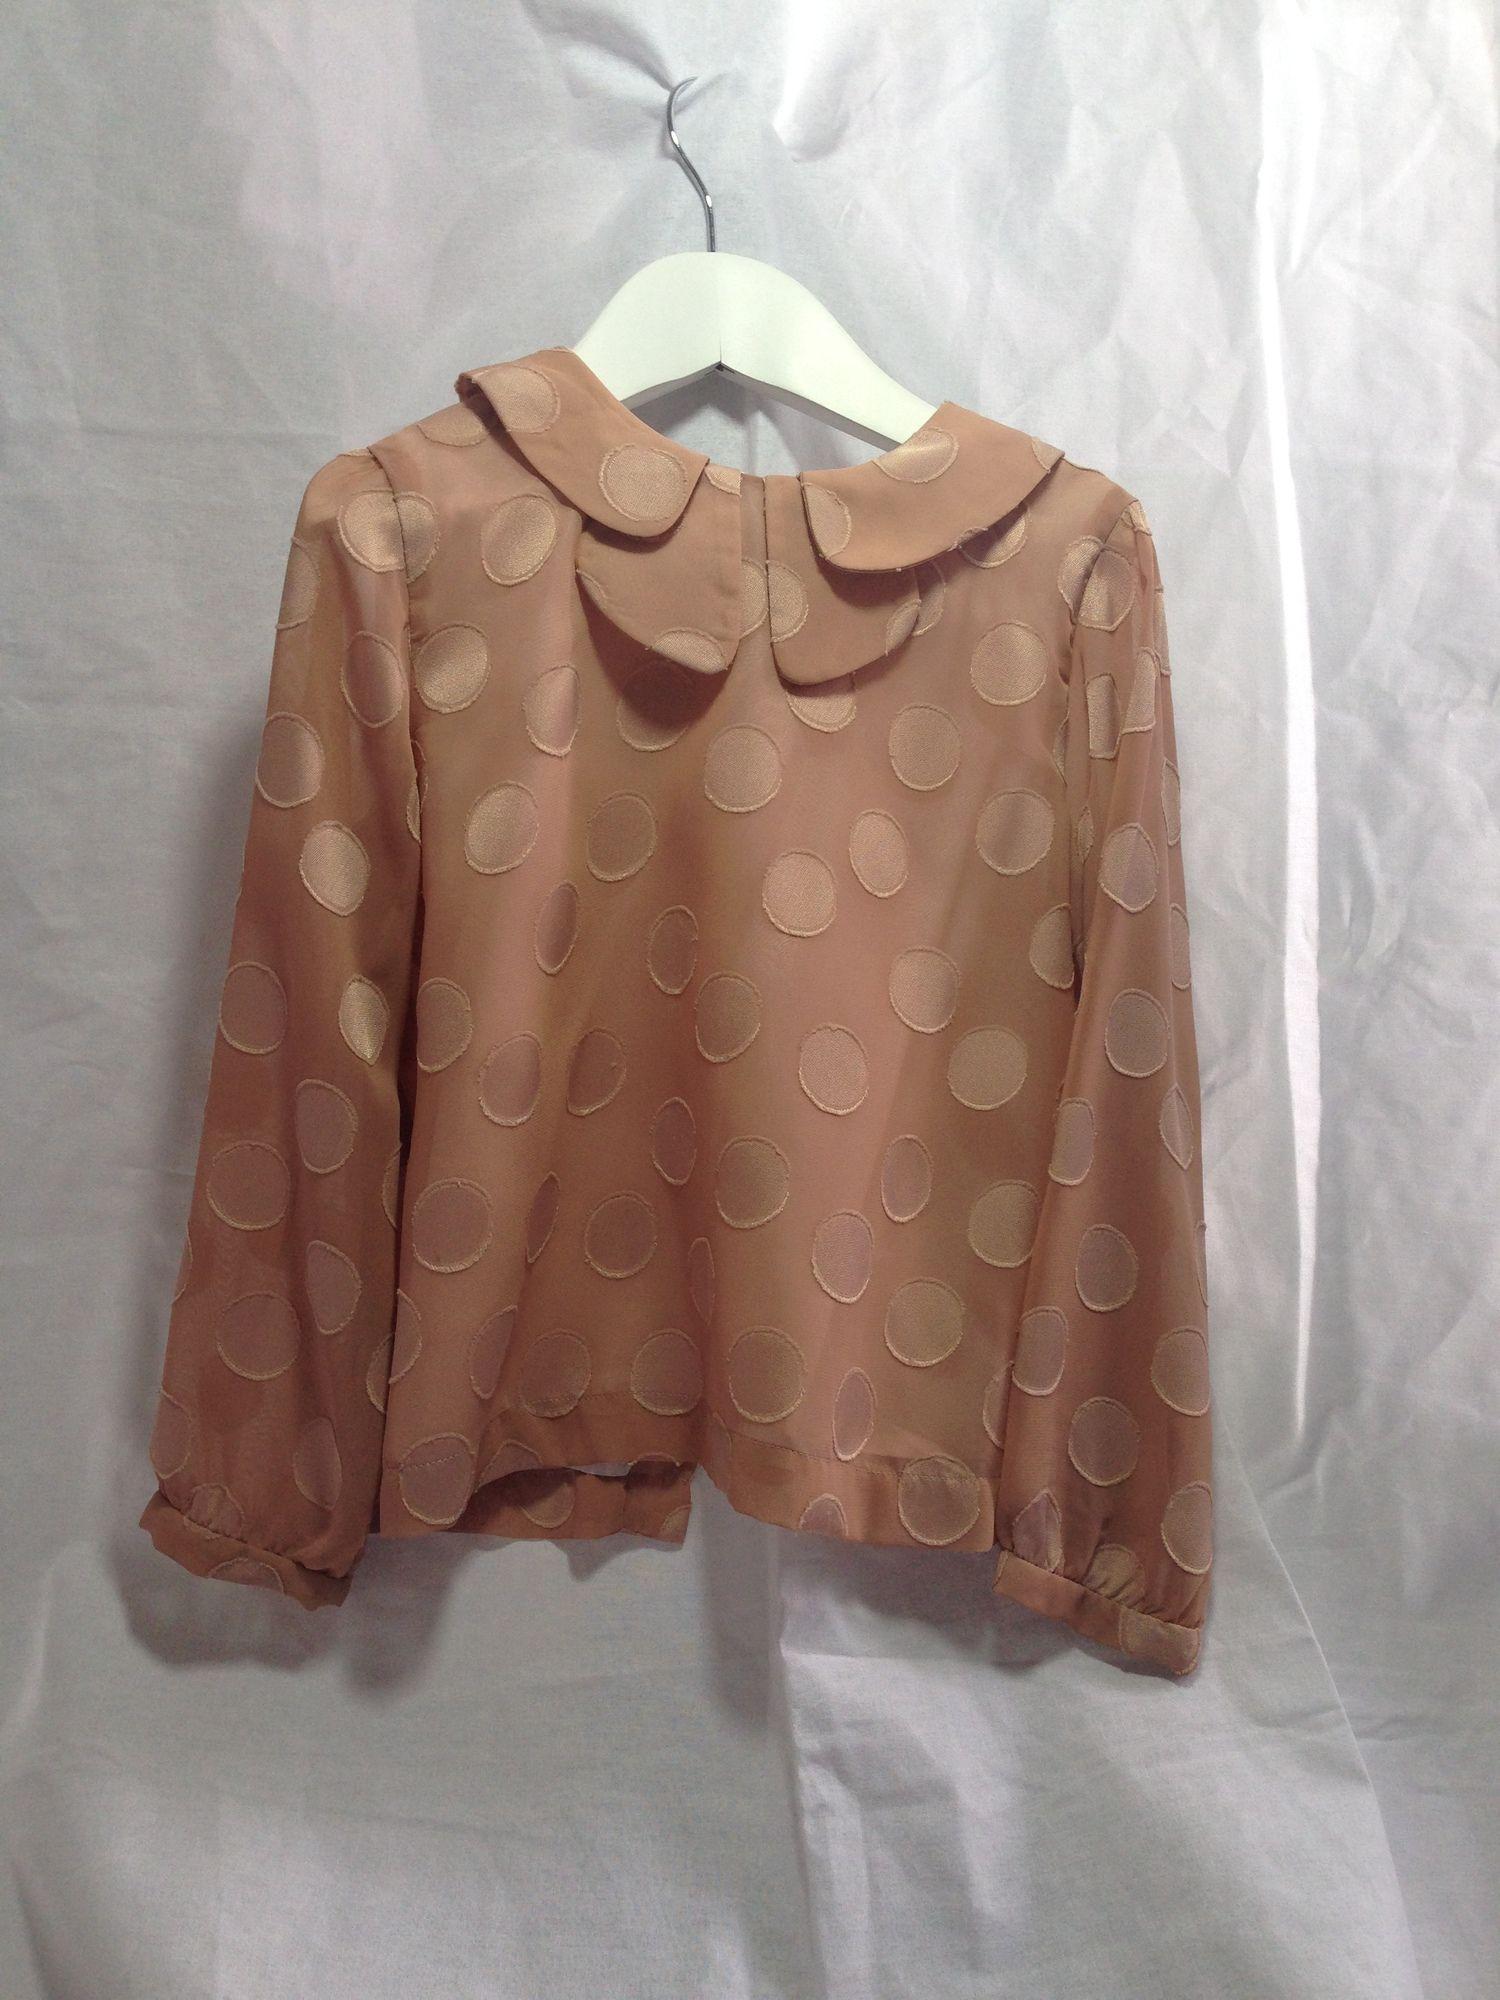 Hucklebones Pink Circle Pattern shirt — My Chelsea Wardrobe